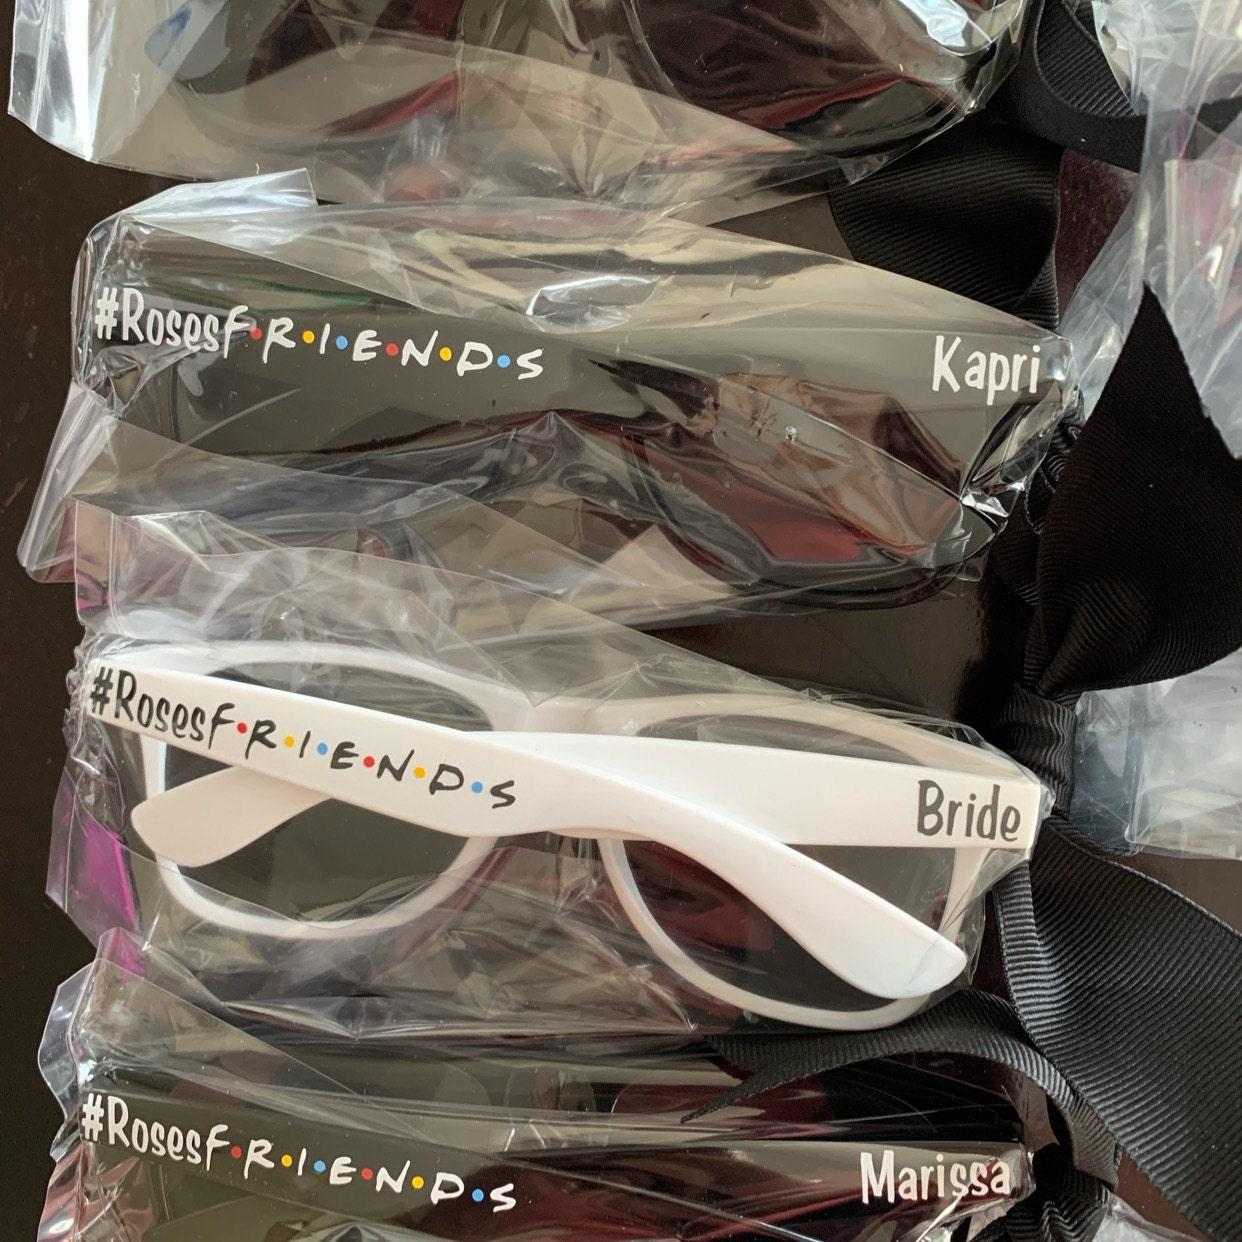 Marissa Gutierrez added a photo of their purchase